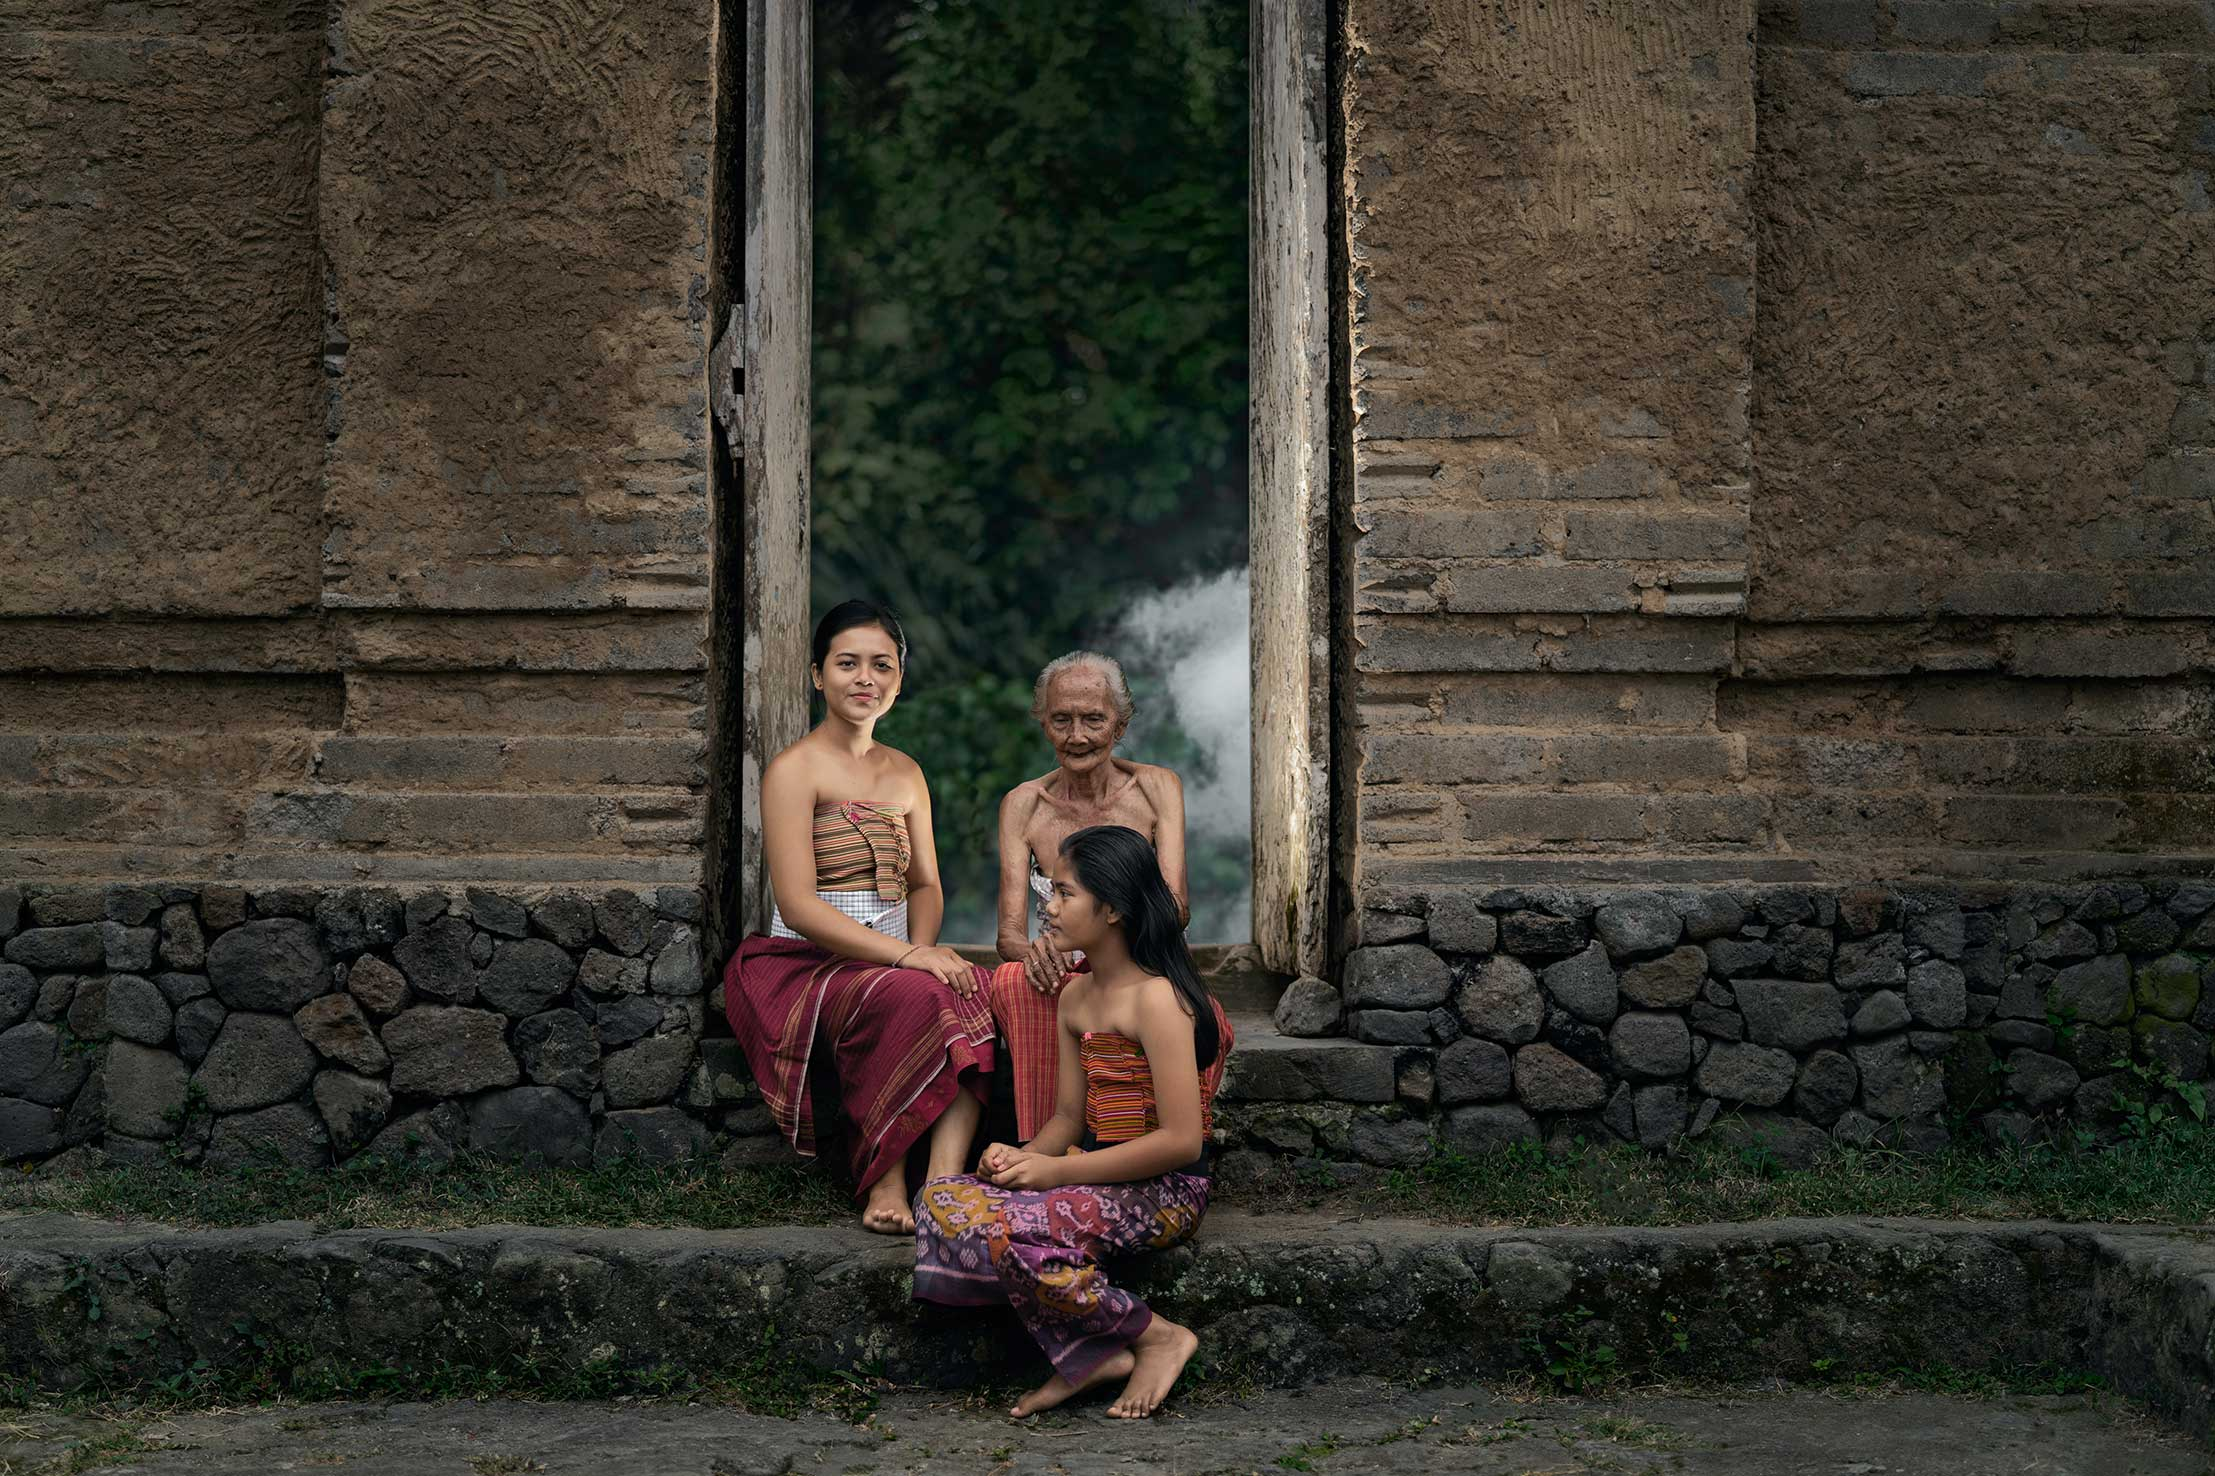 https://natadesa.com/wp-content/uploads/2021/08/nelbali-photography-EgVgEc6C-Vo-unsplash-1.jpg